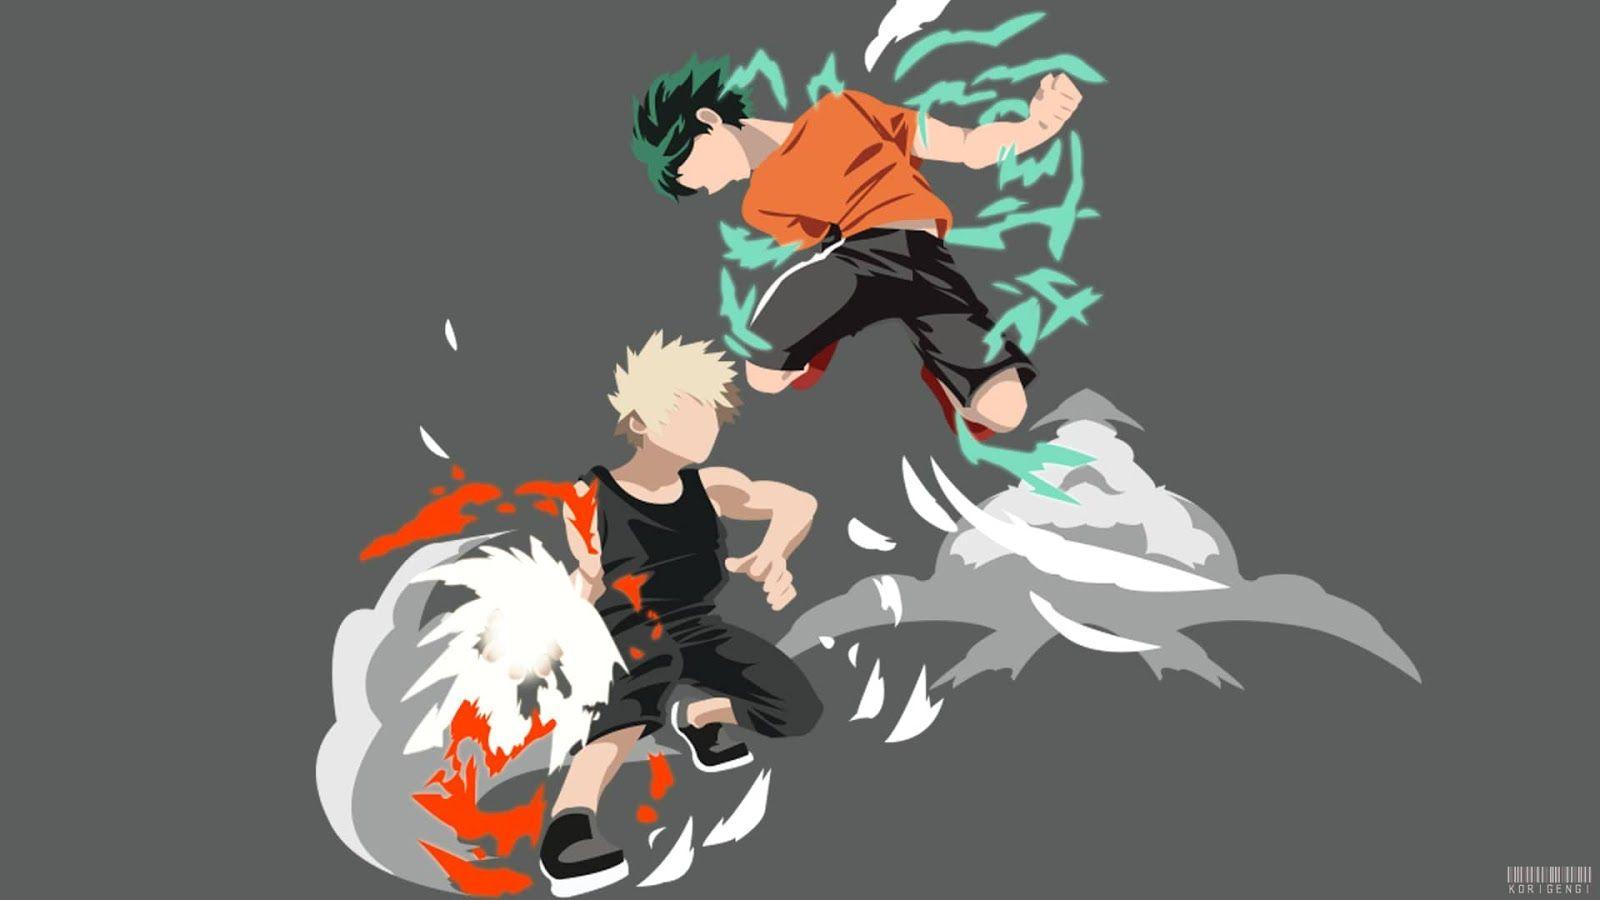 Pc Bakugo Vs Midoriya Hero Wallpaper Minimalist Wallpaper Anime